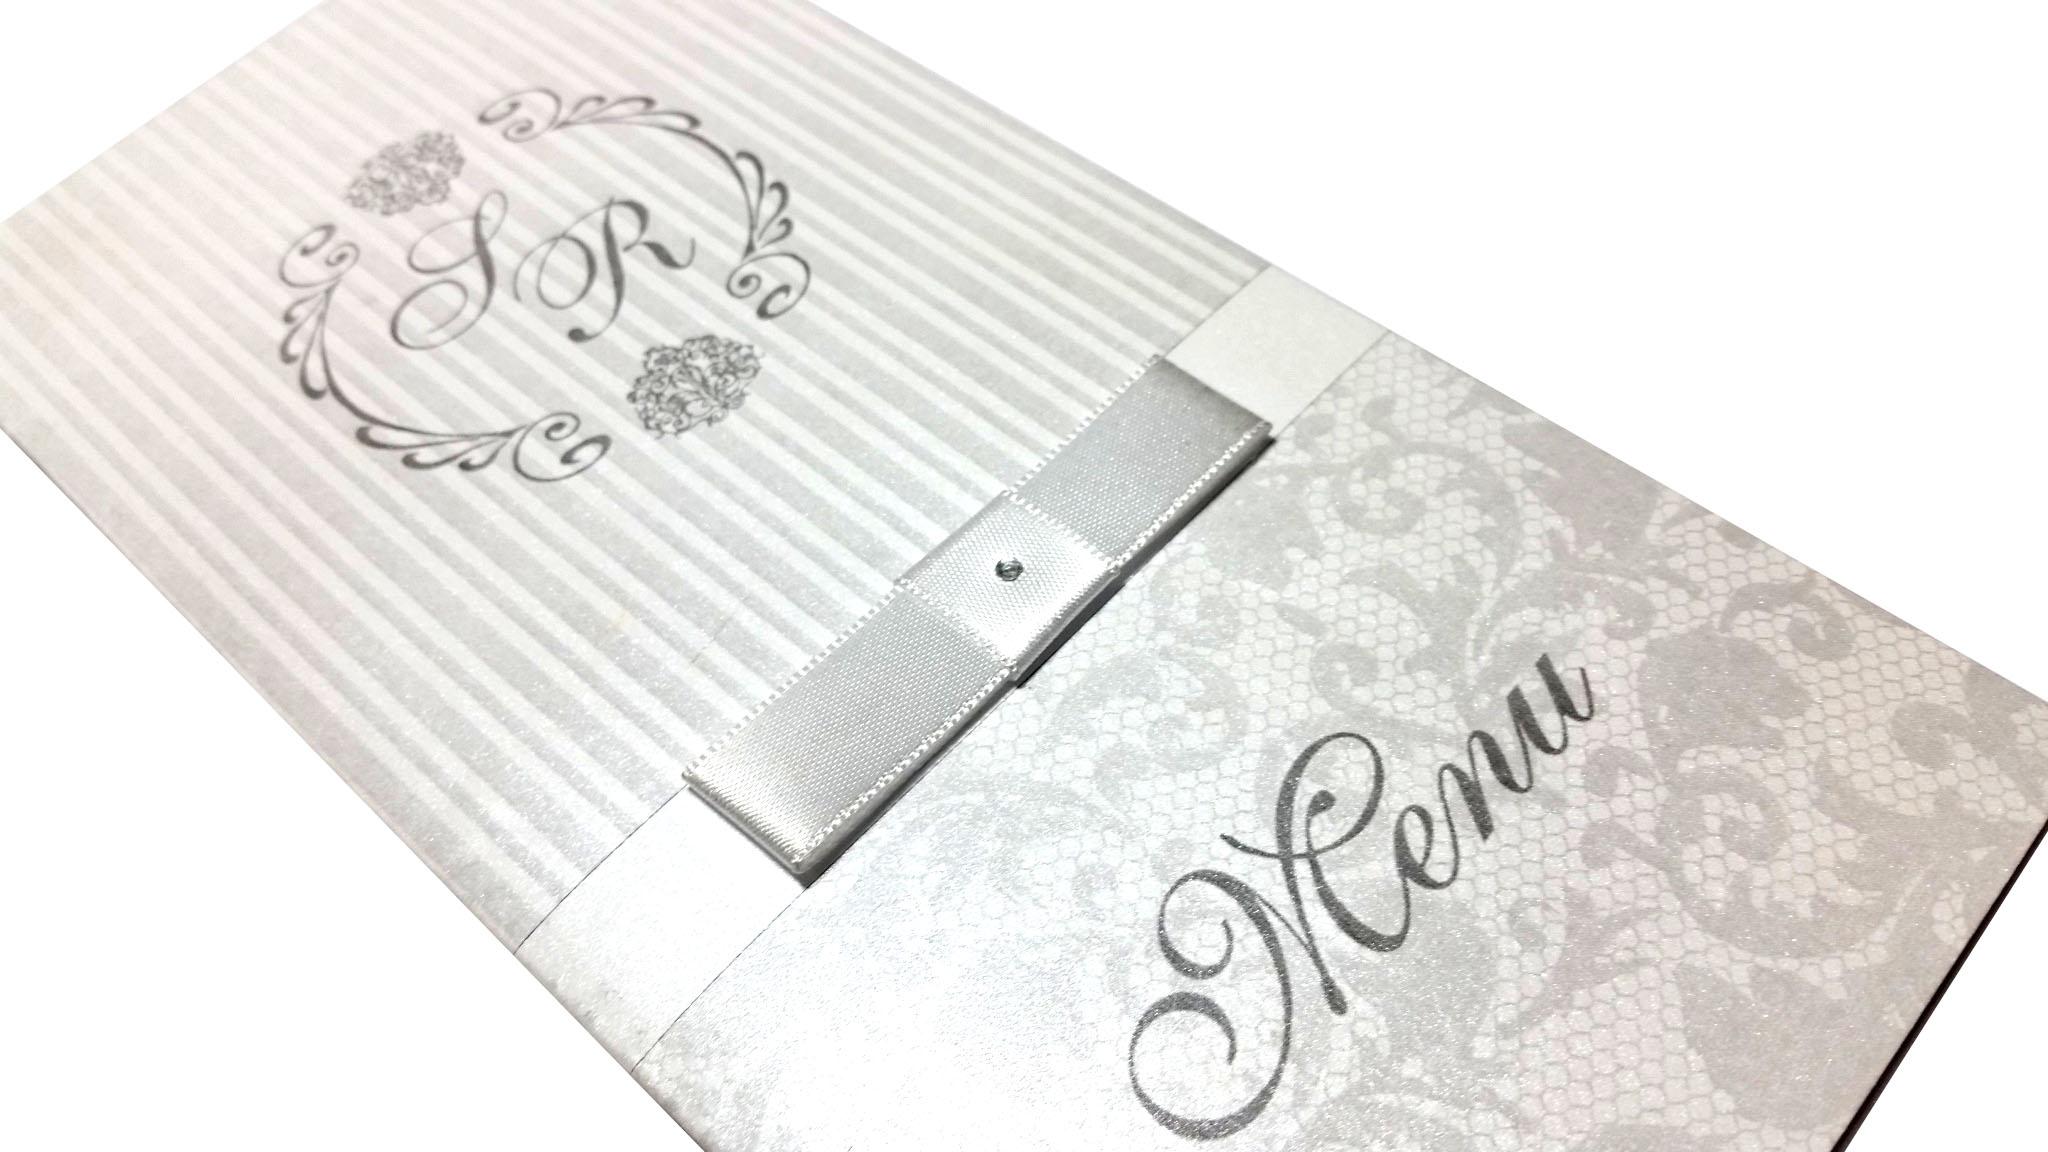 REF 0246 - Menu G